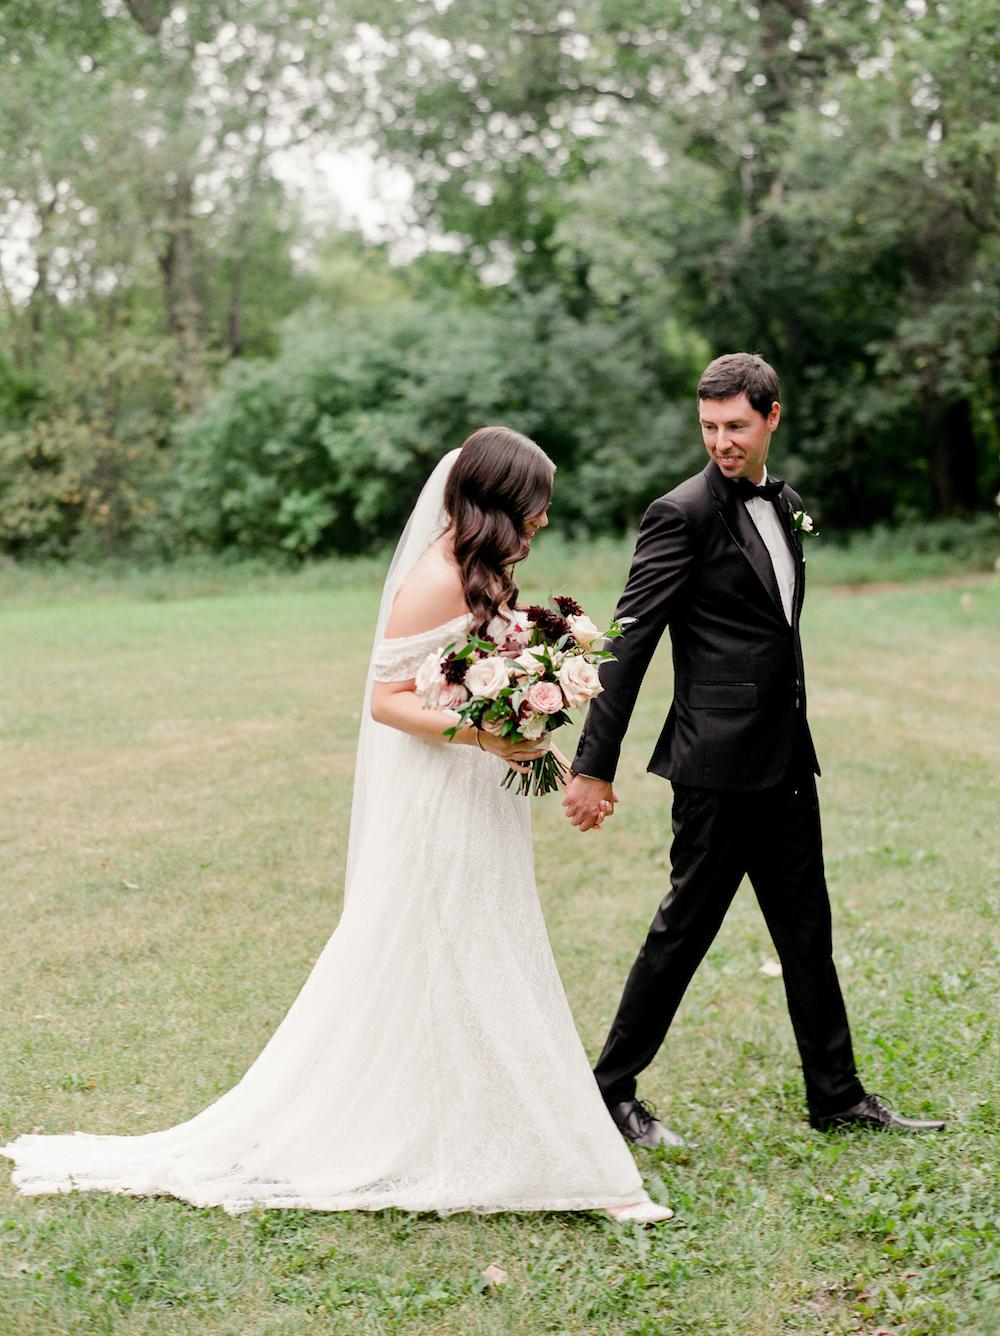 Romantic Wedding Photos Winnipeg - Weddings in Winnipeg